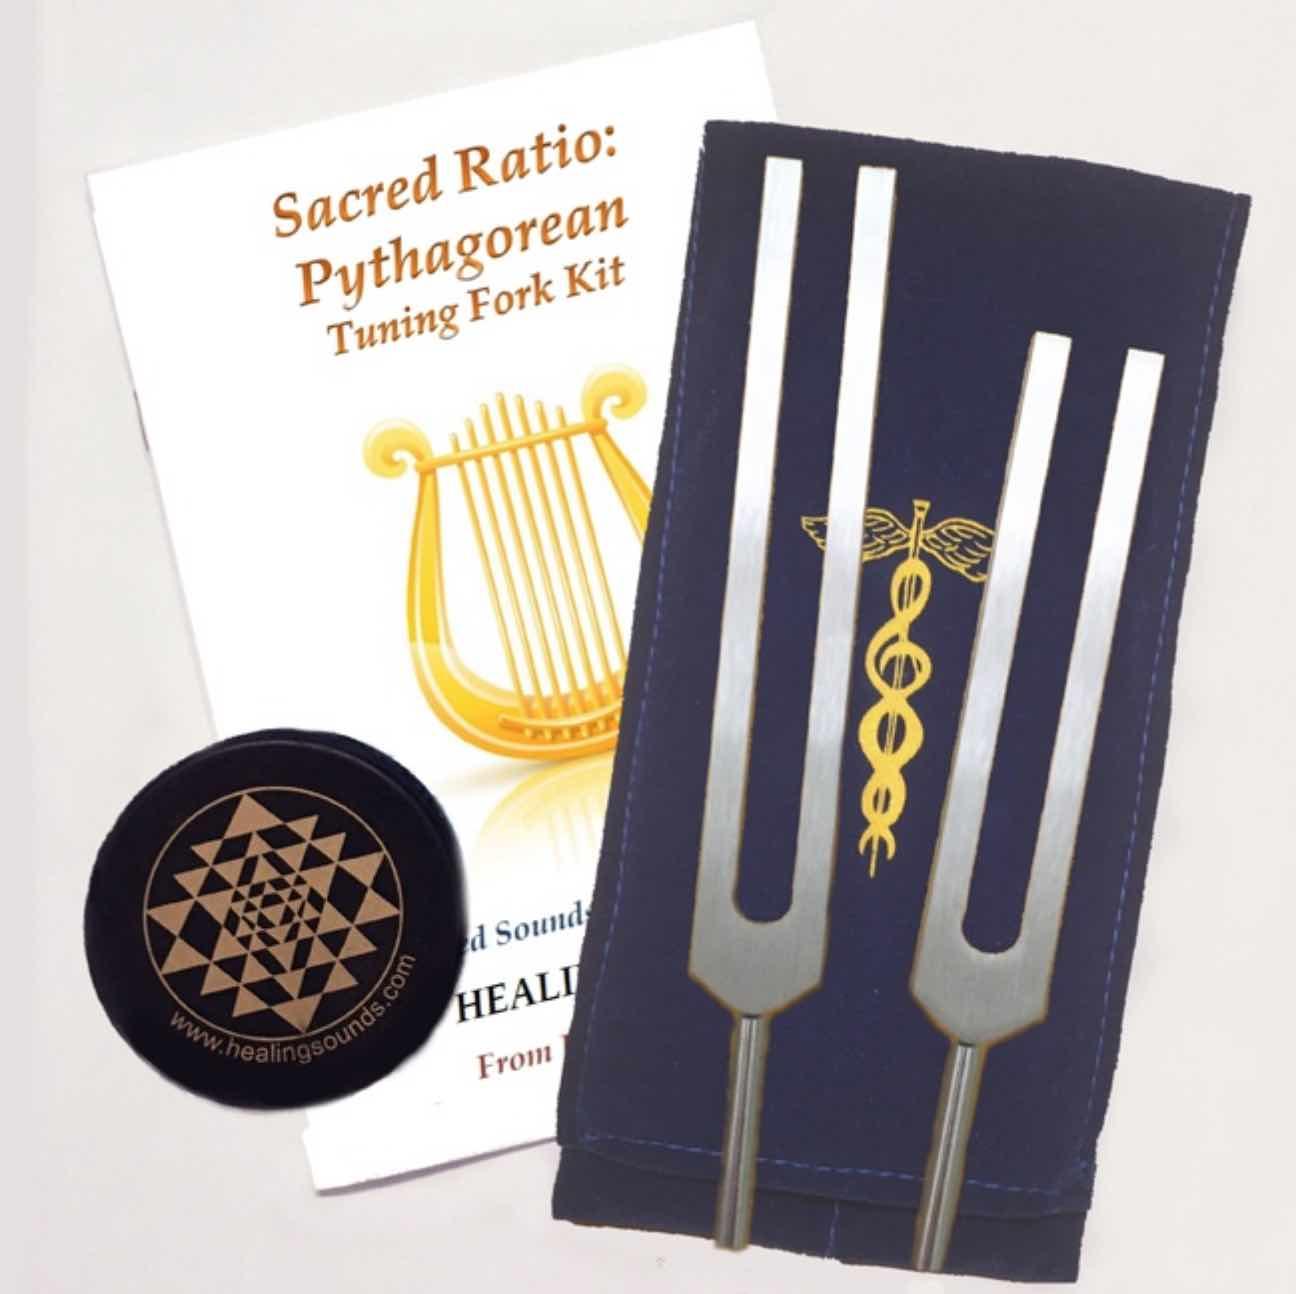 Goldman Pythagorean Tuning Fork Kit